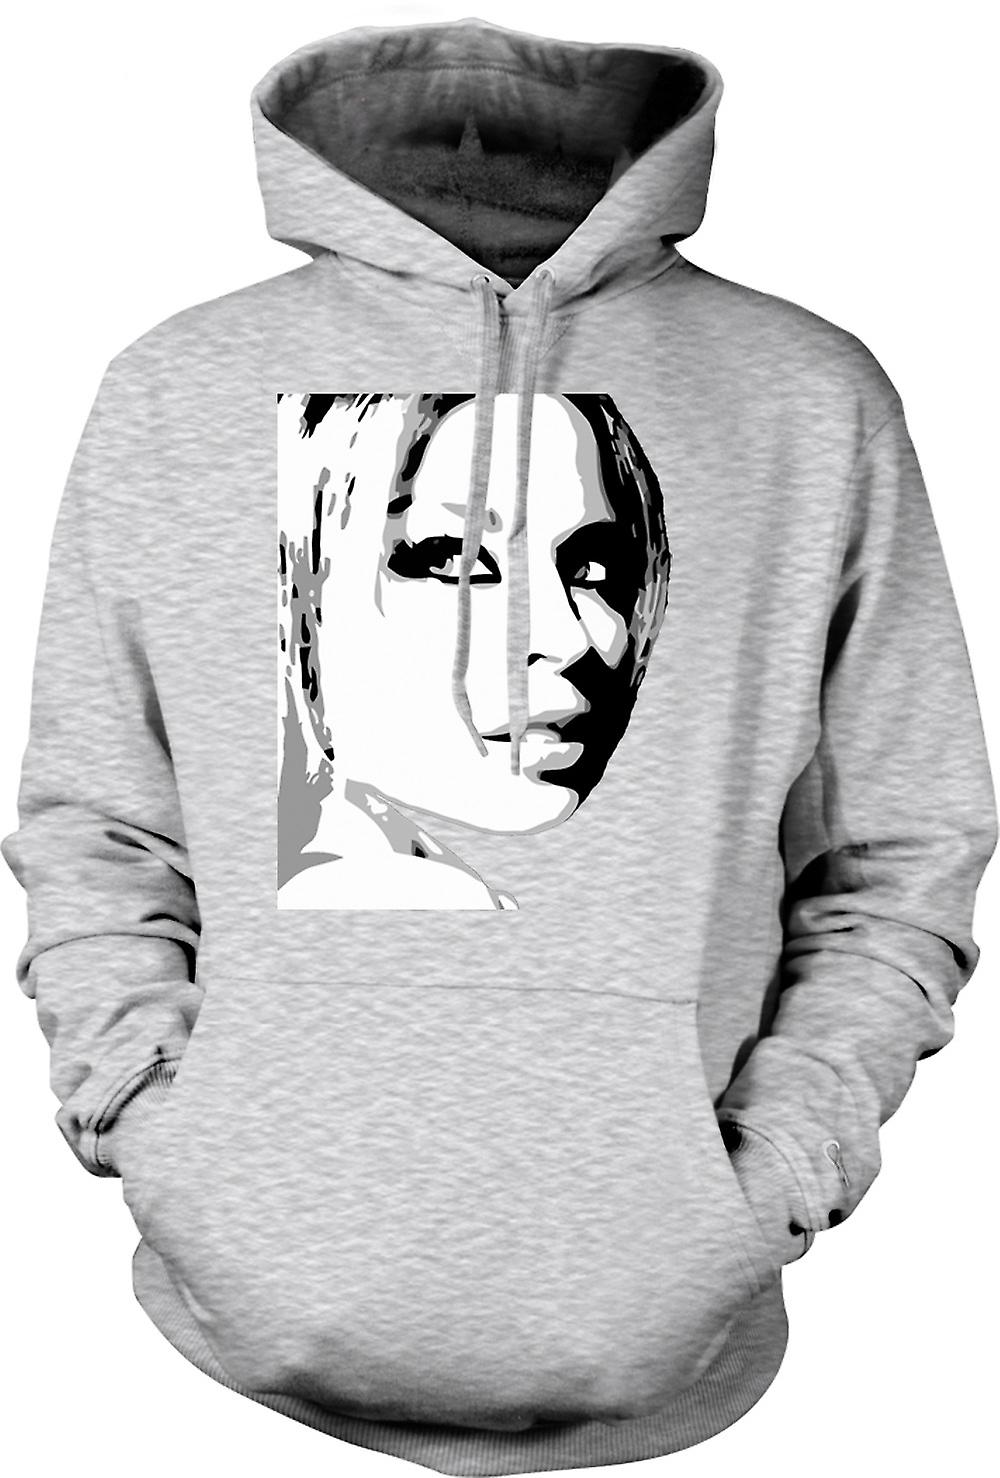 Para hombre con capucha - Kylie Minogue - BW